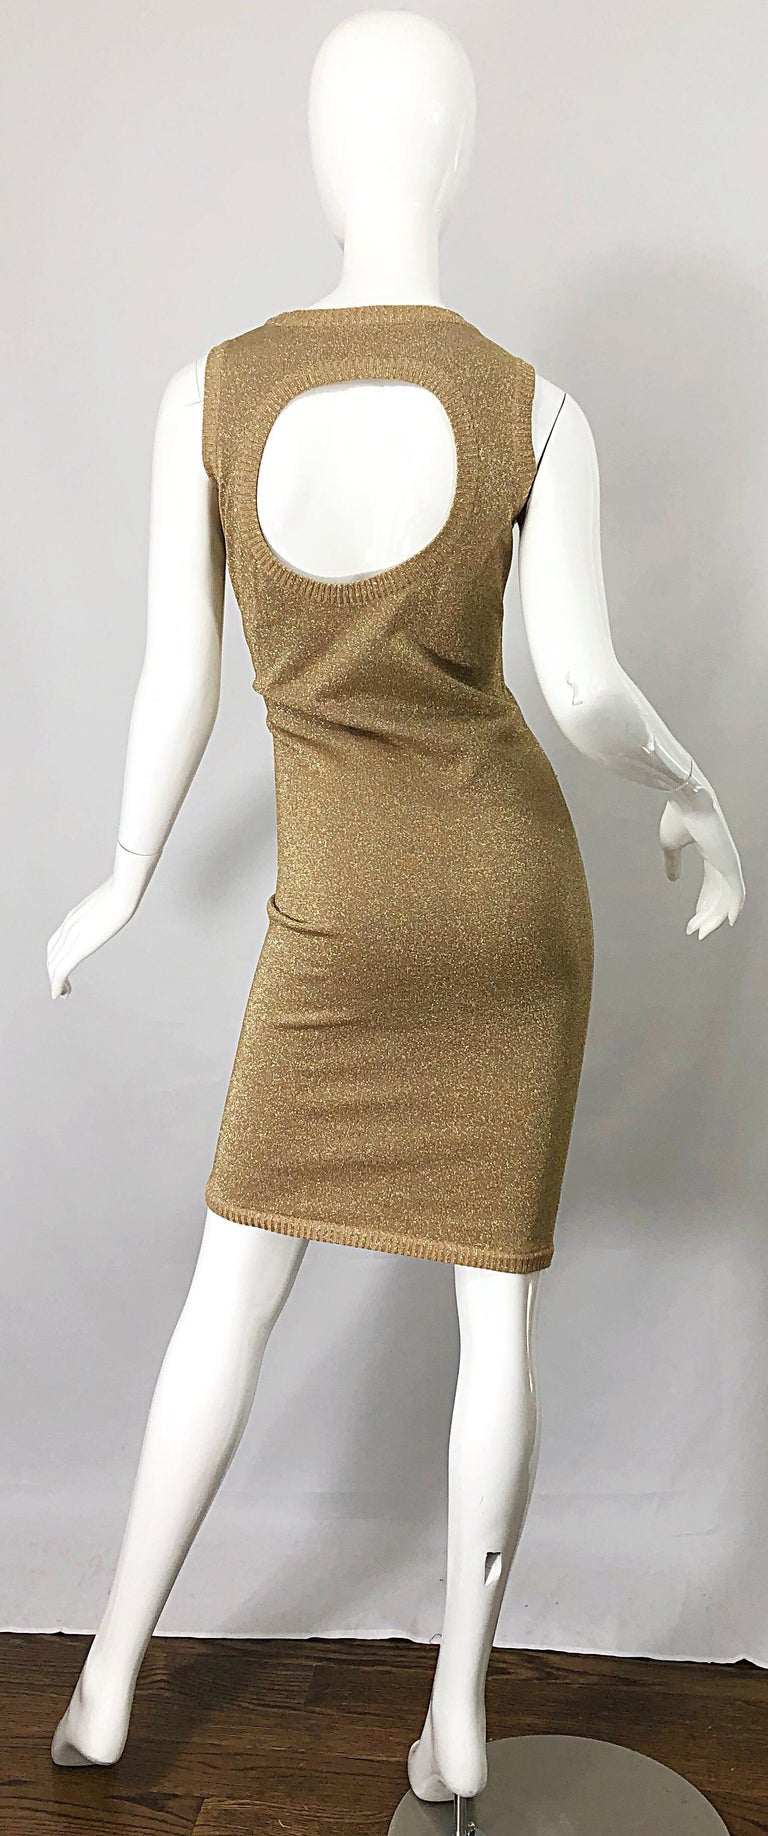 Mila Schoon 1990s Gold Metallic Cut - Out Back Vintage 90s Bodycon Dress For Sale 4